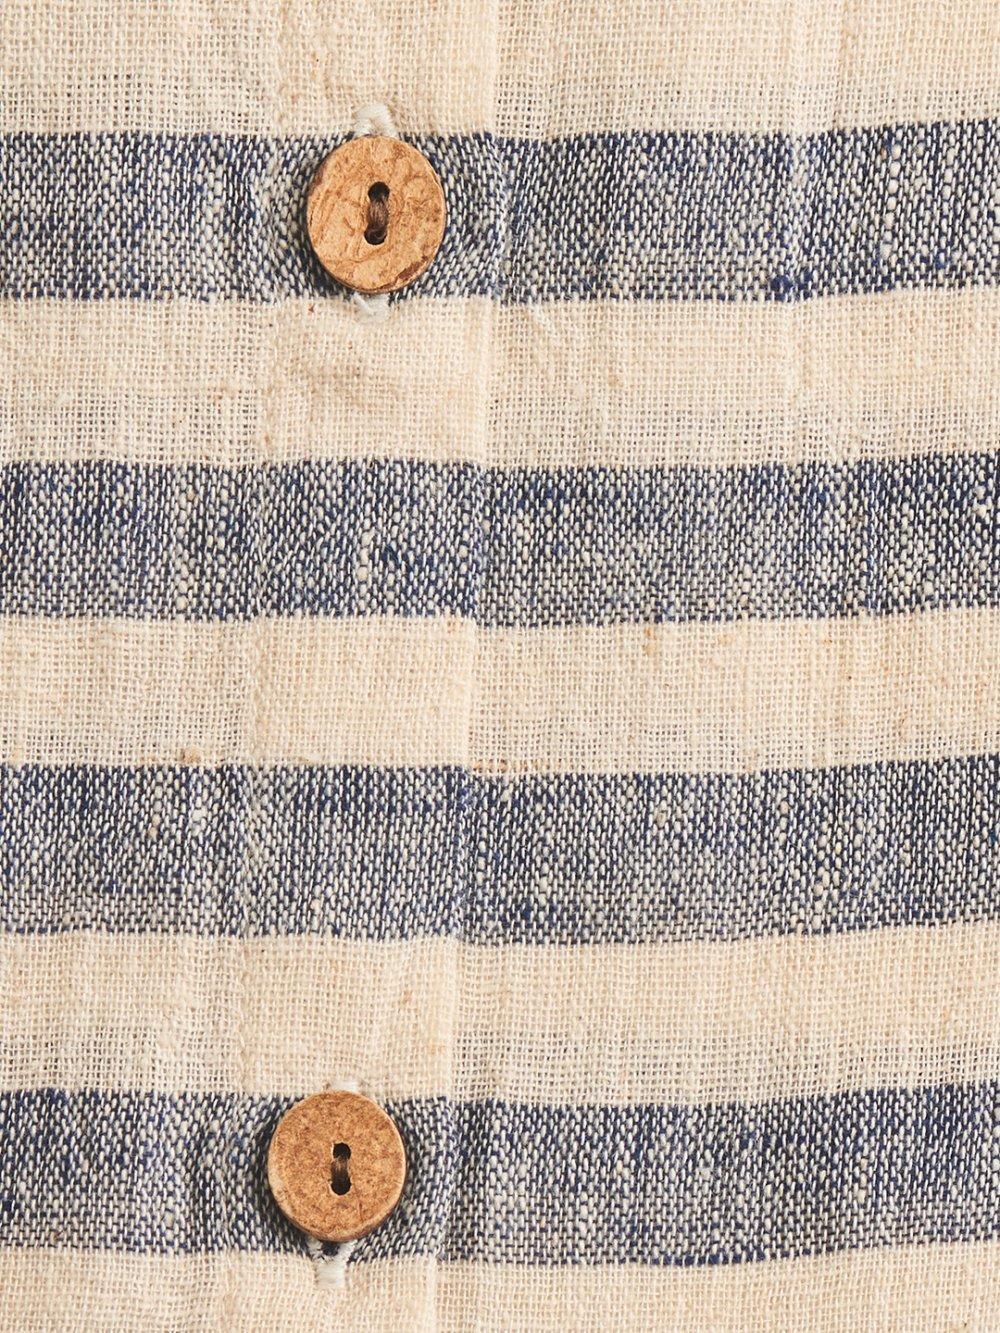 Organic Clothing Linen Fashion Texture